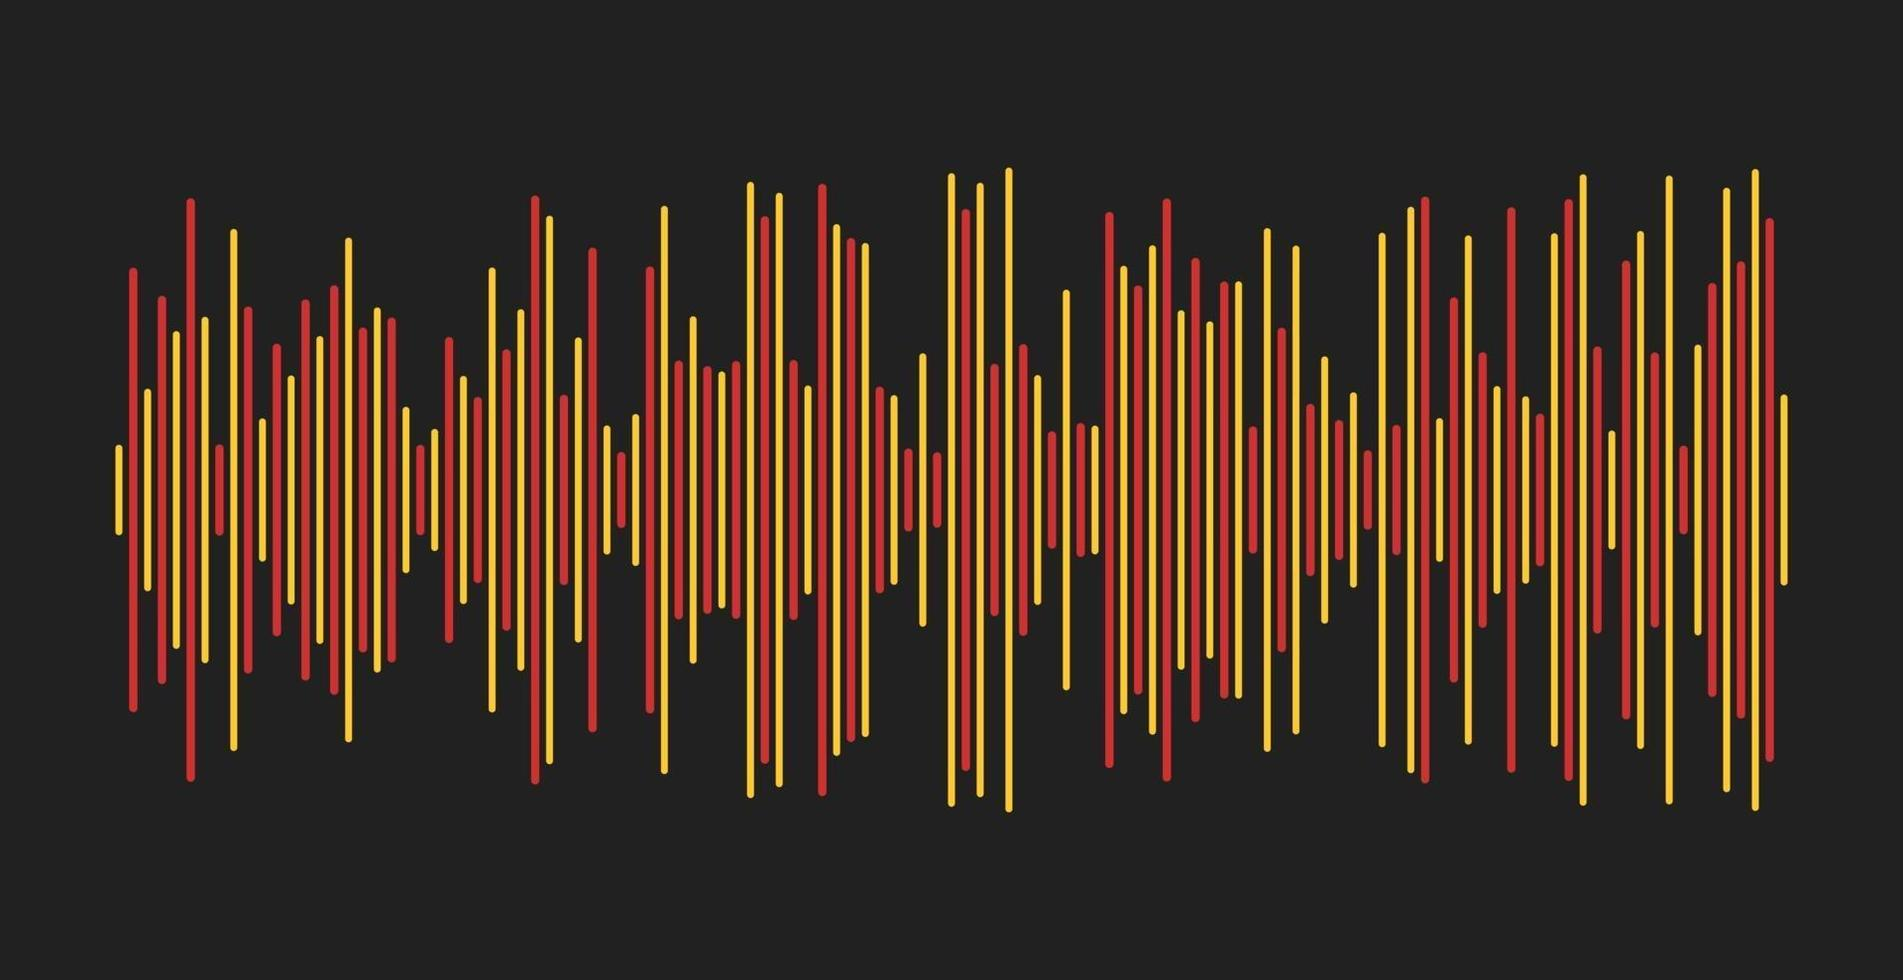 onde sonore bicolore sur fond sombre vecteur